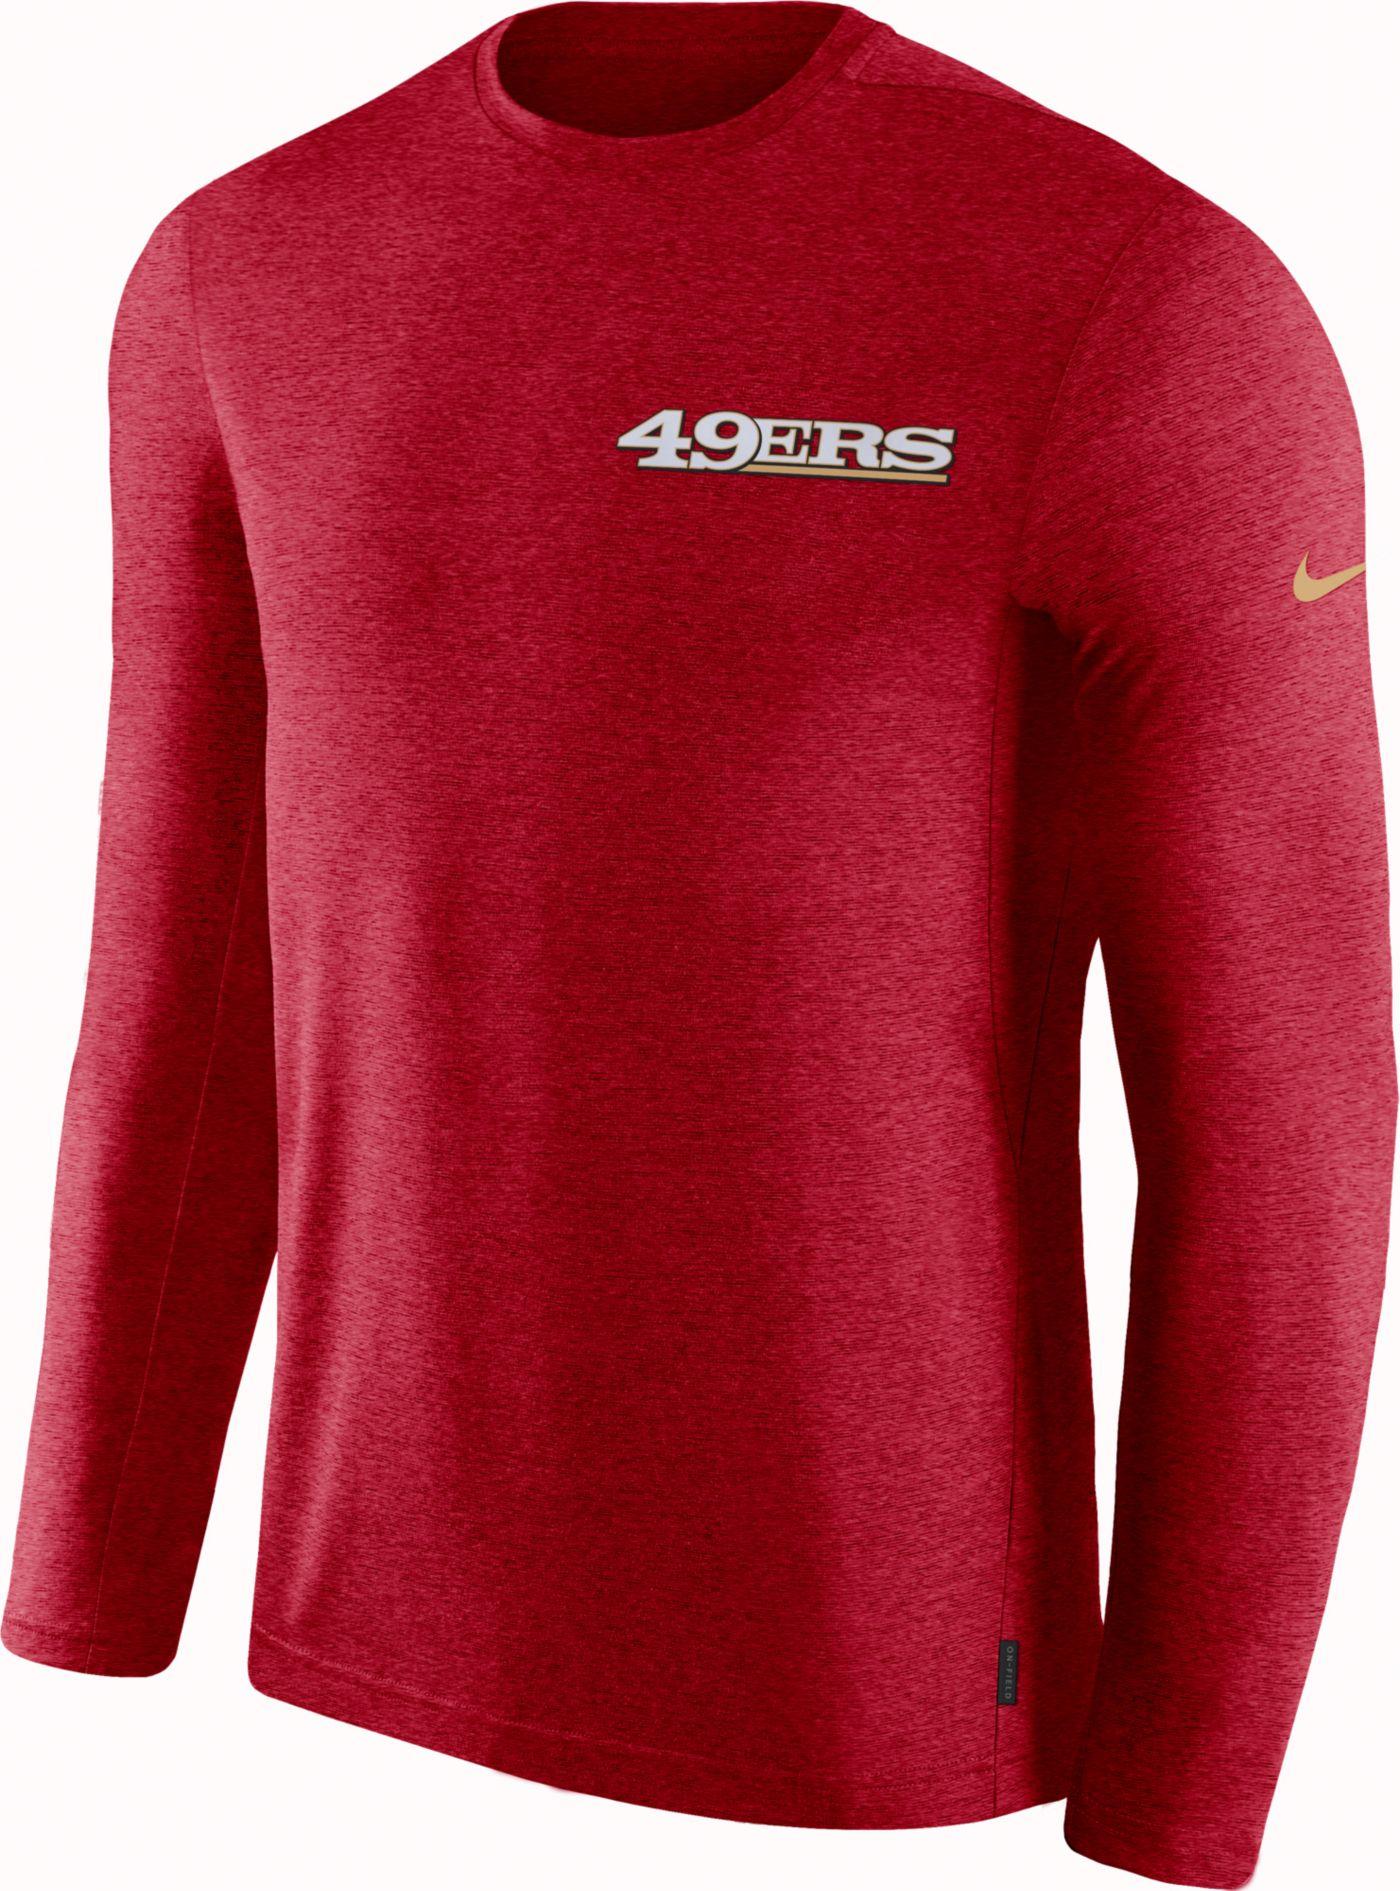 Nike Men's San Francisco 49ers Sideline Coach Performance Red Long Sleeve Shirt